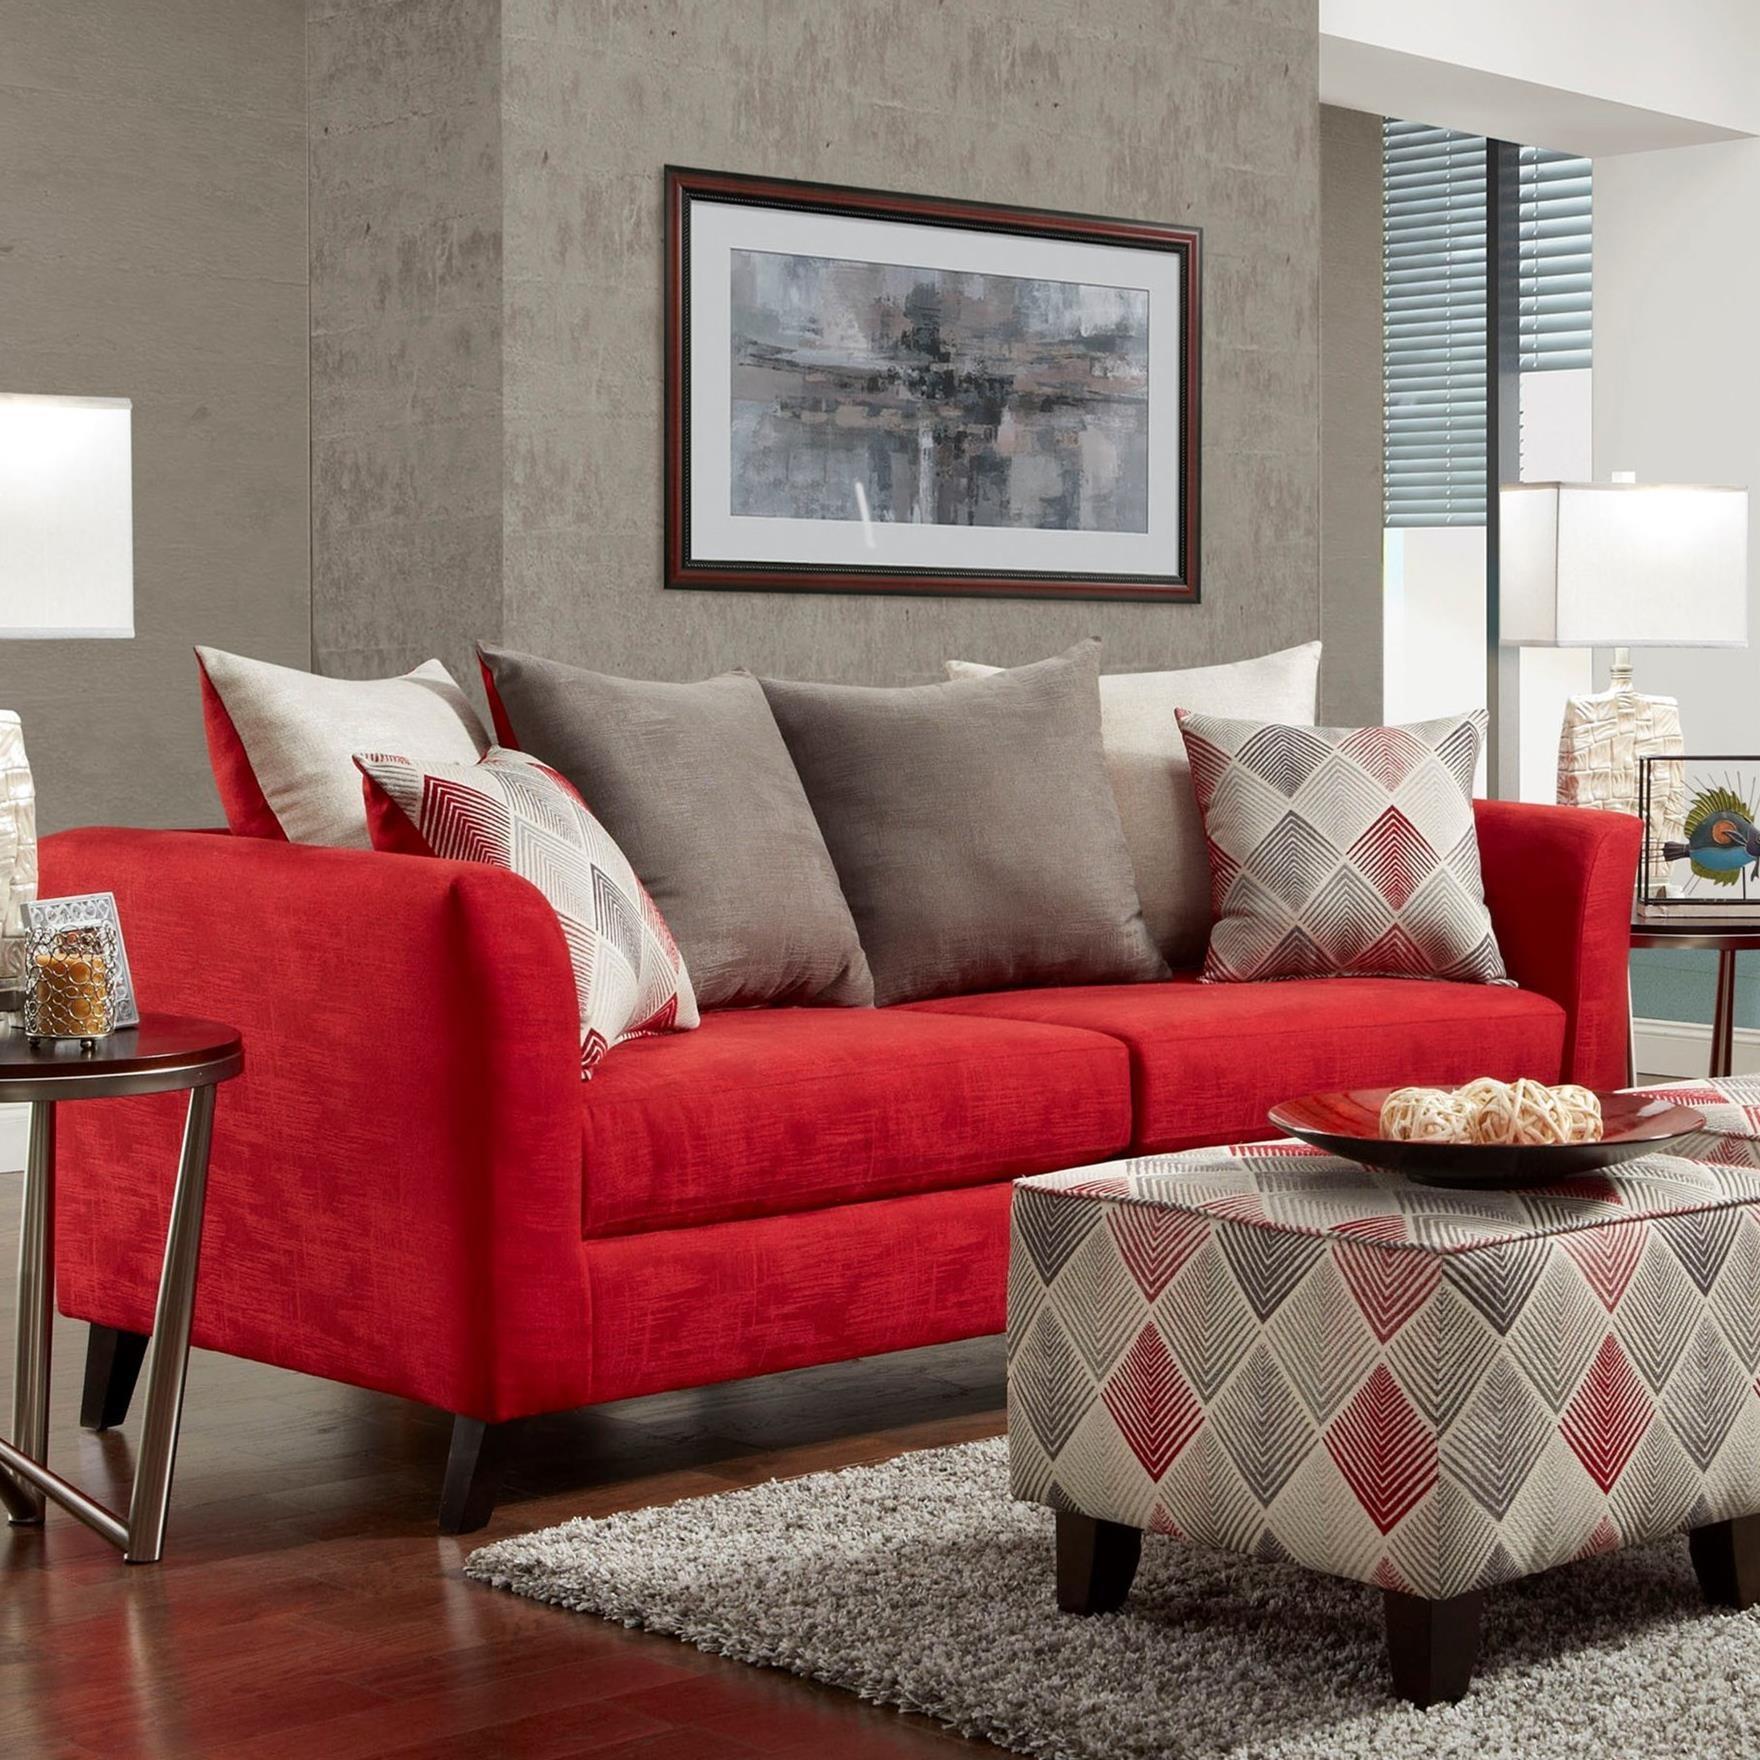 1960 Stationary Sofa by Washington Furniture at Lynn's Furniture & Mattress